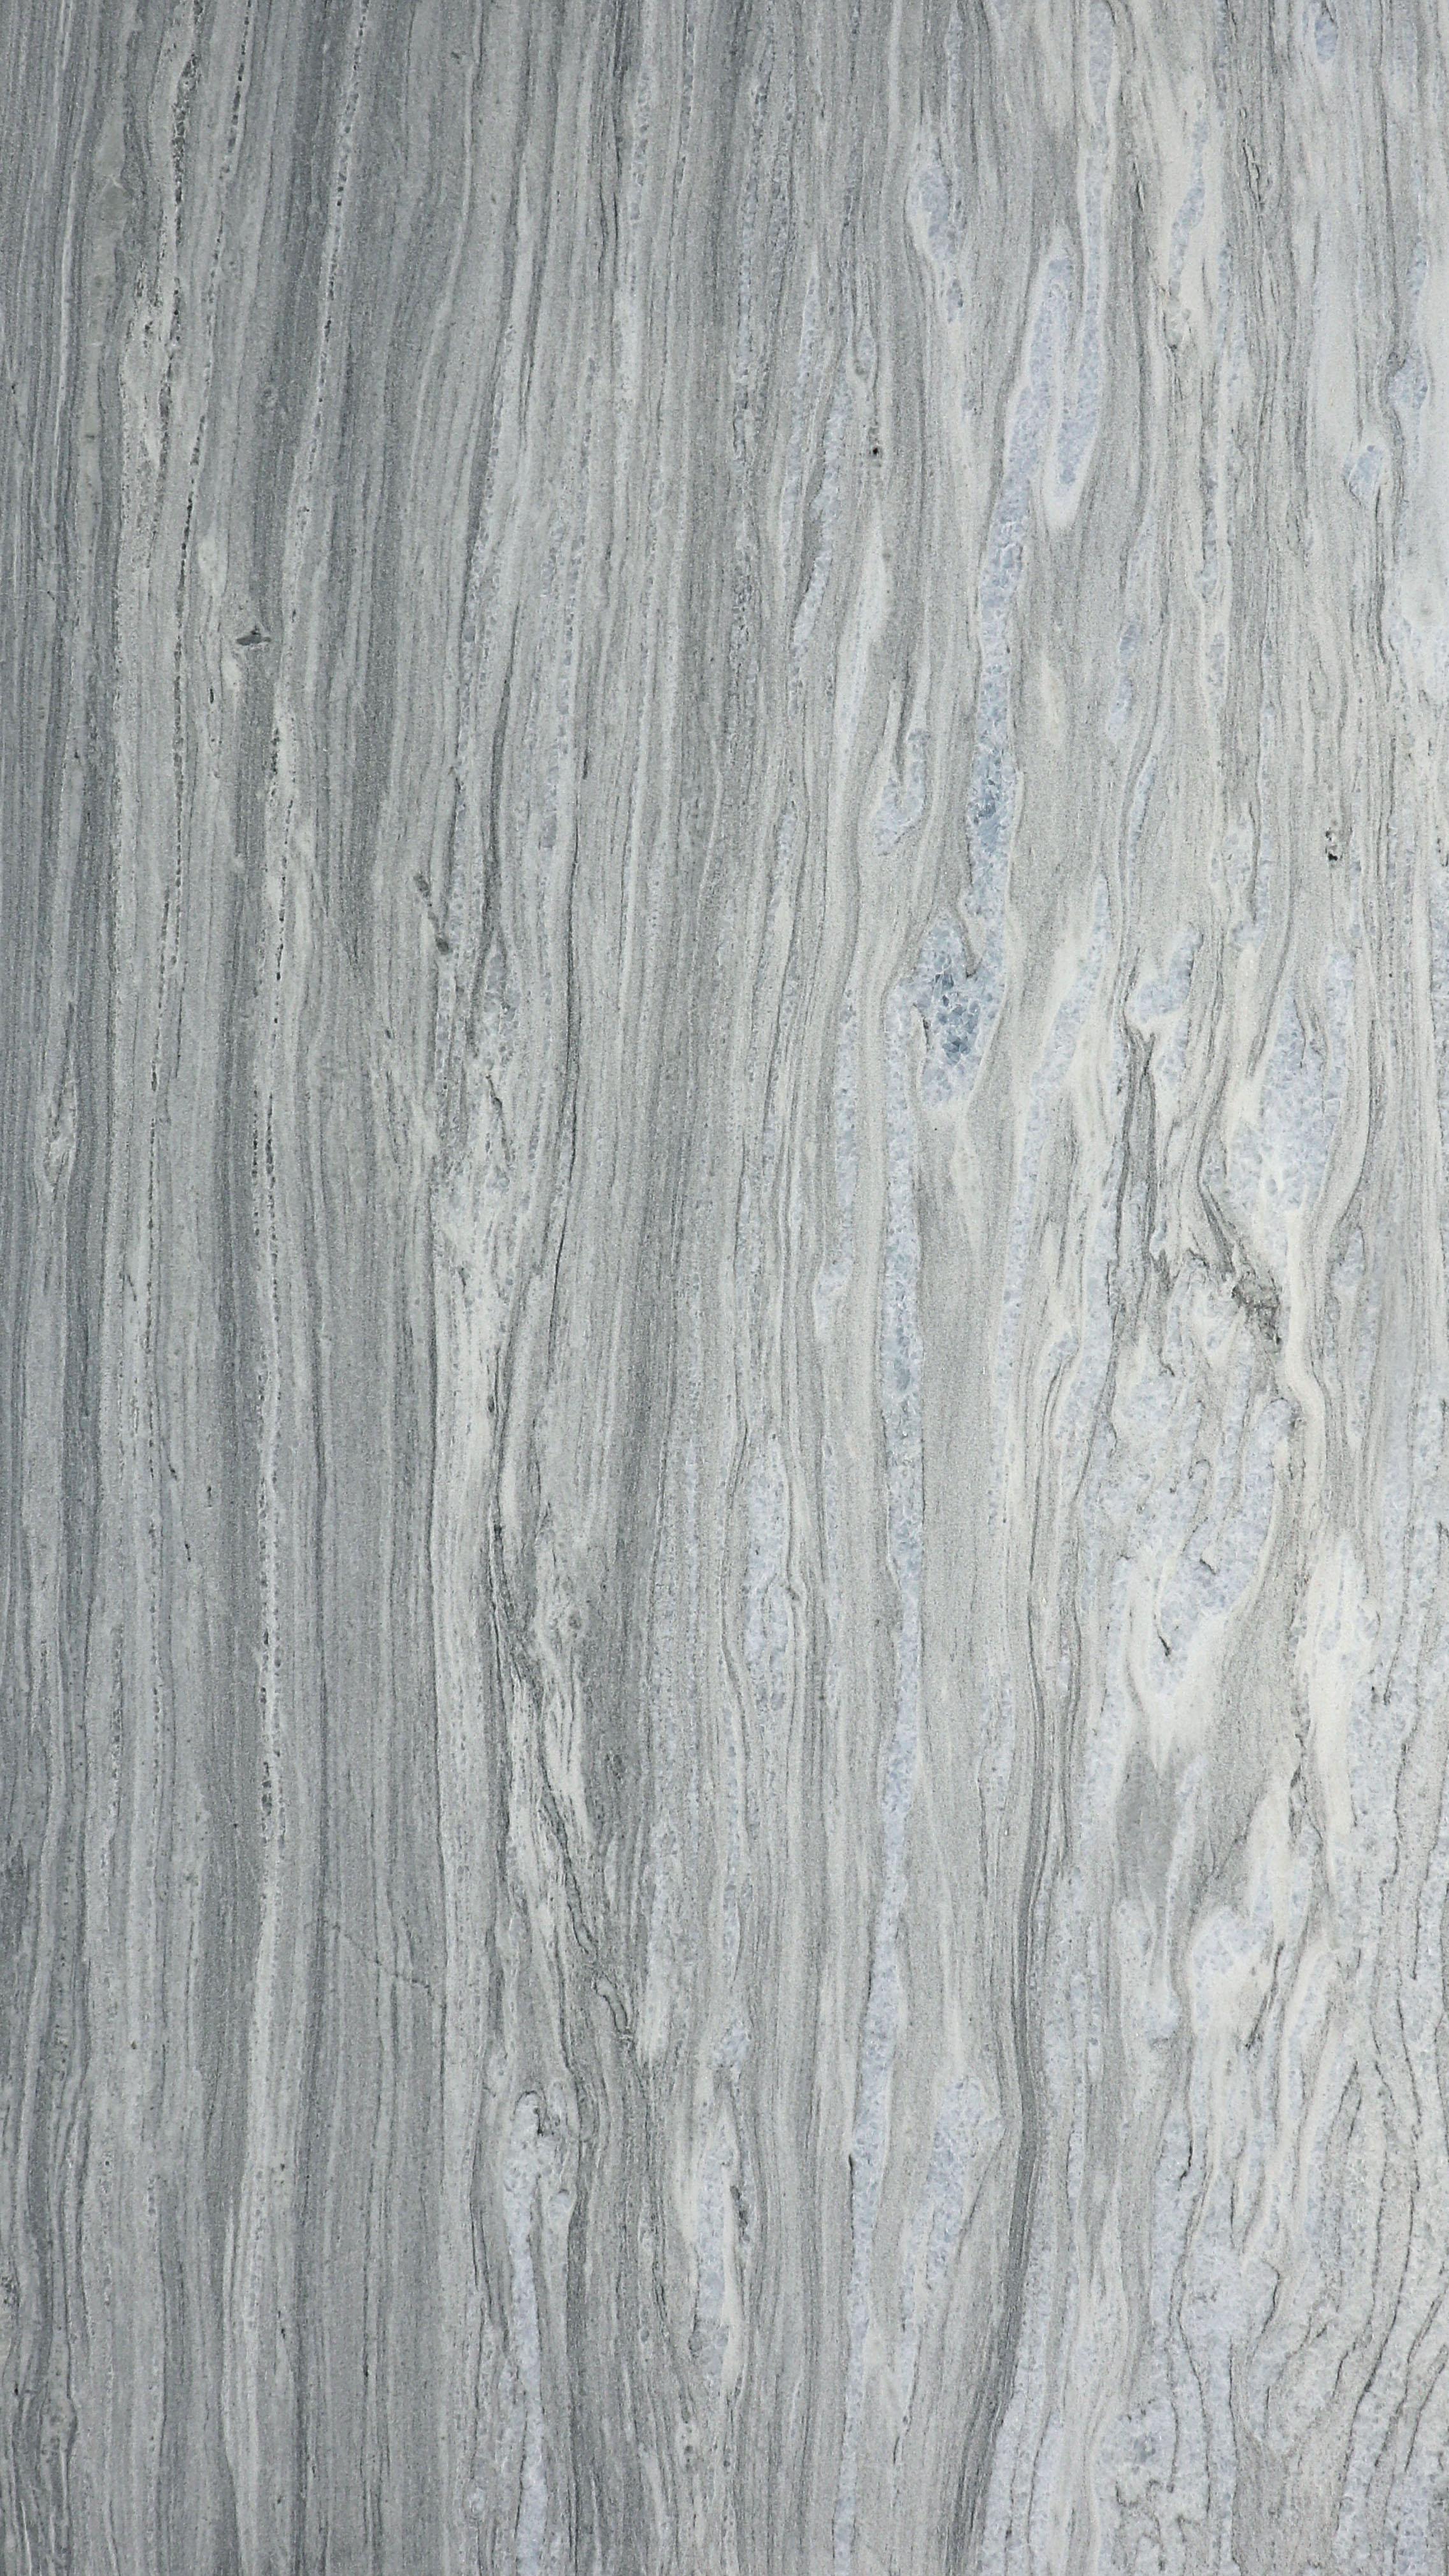 TESORO GRIGIO Marble